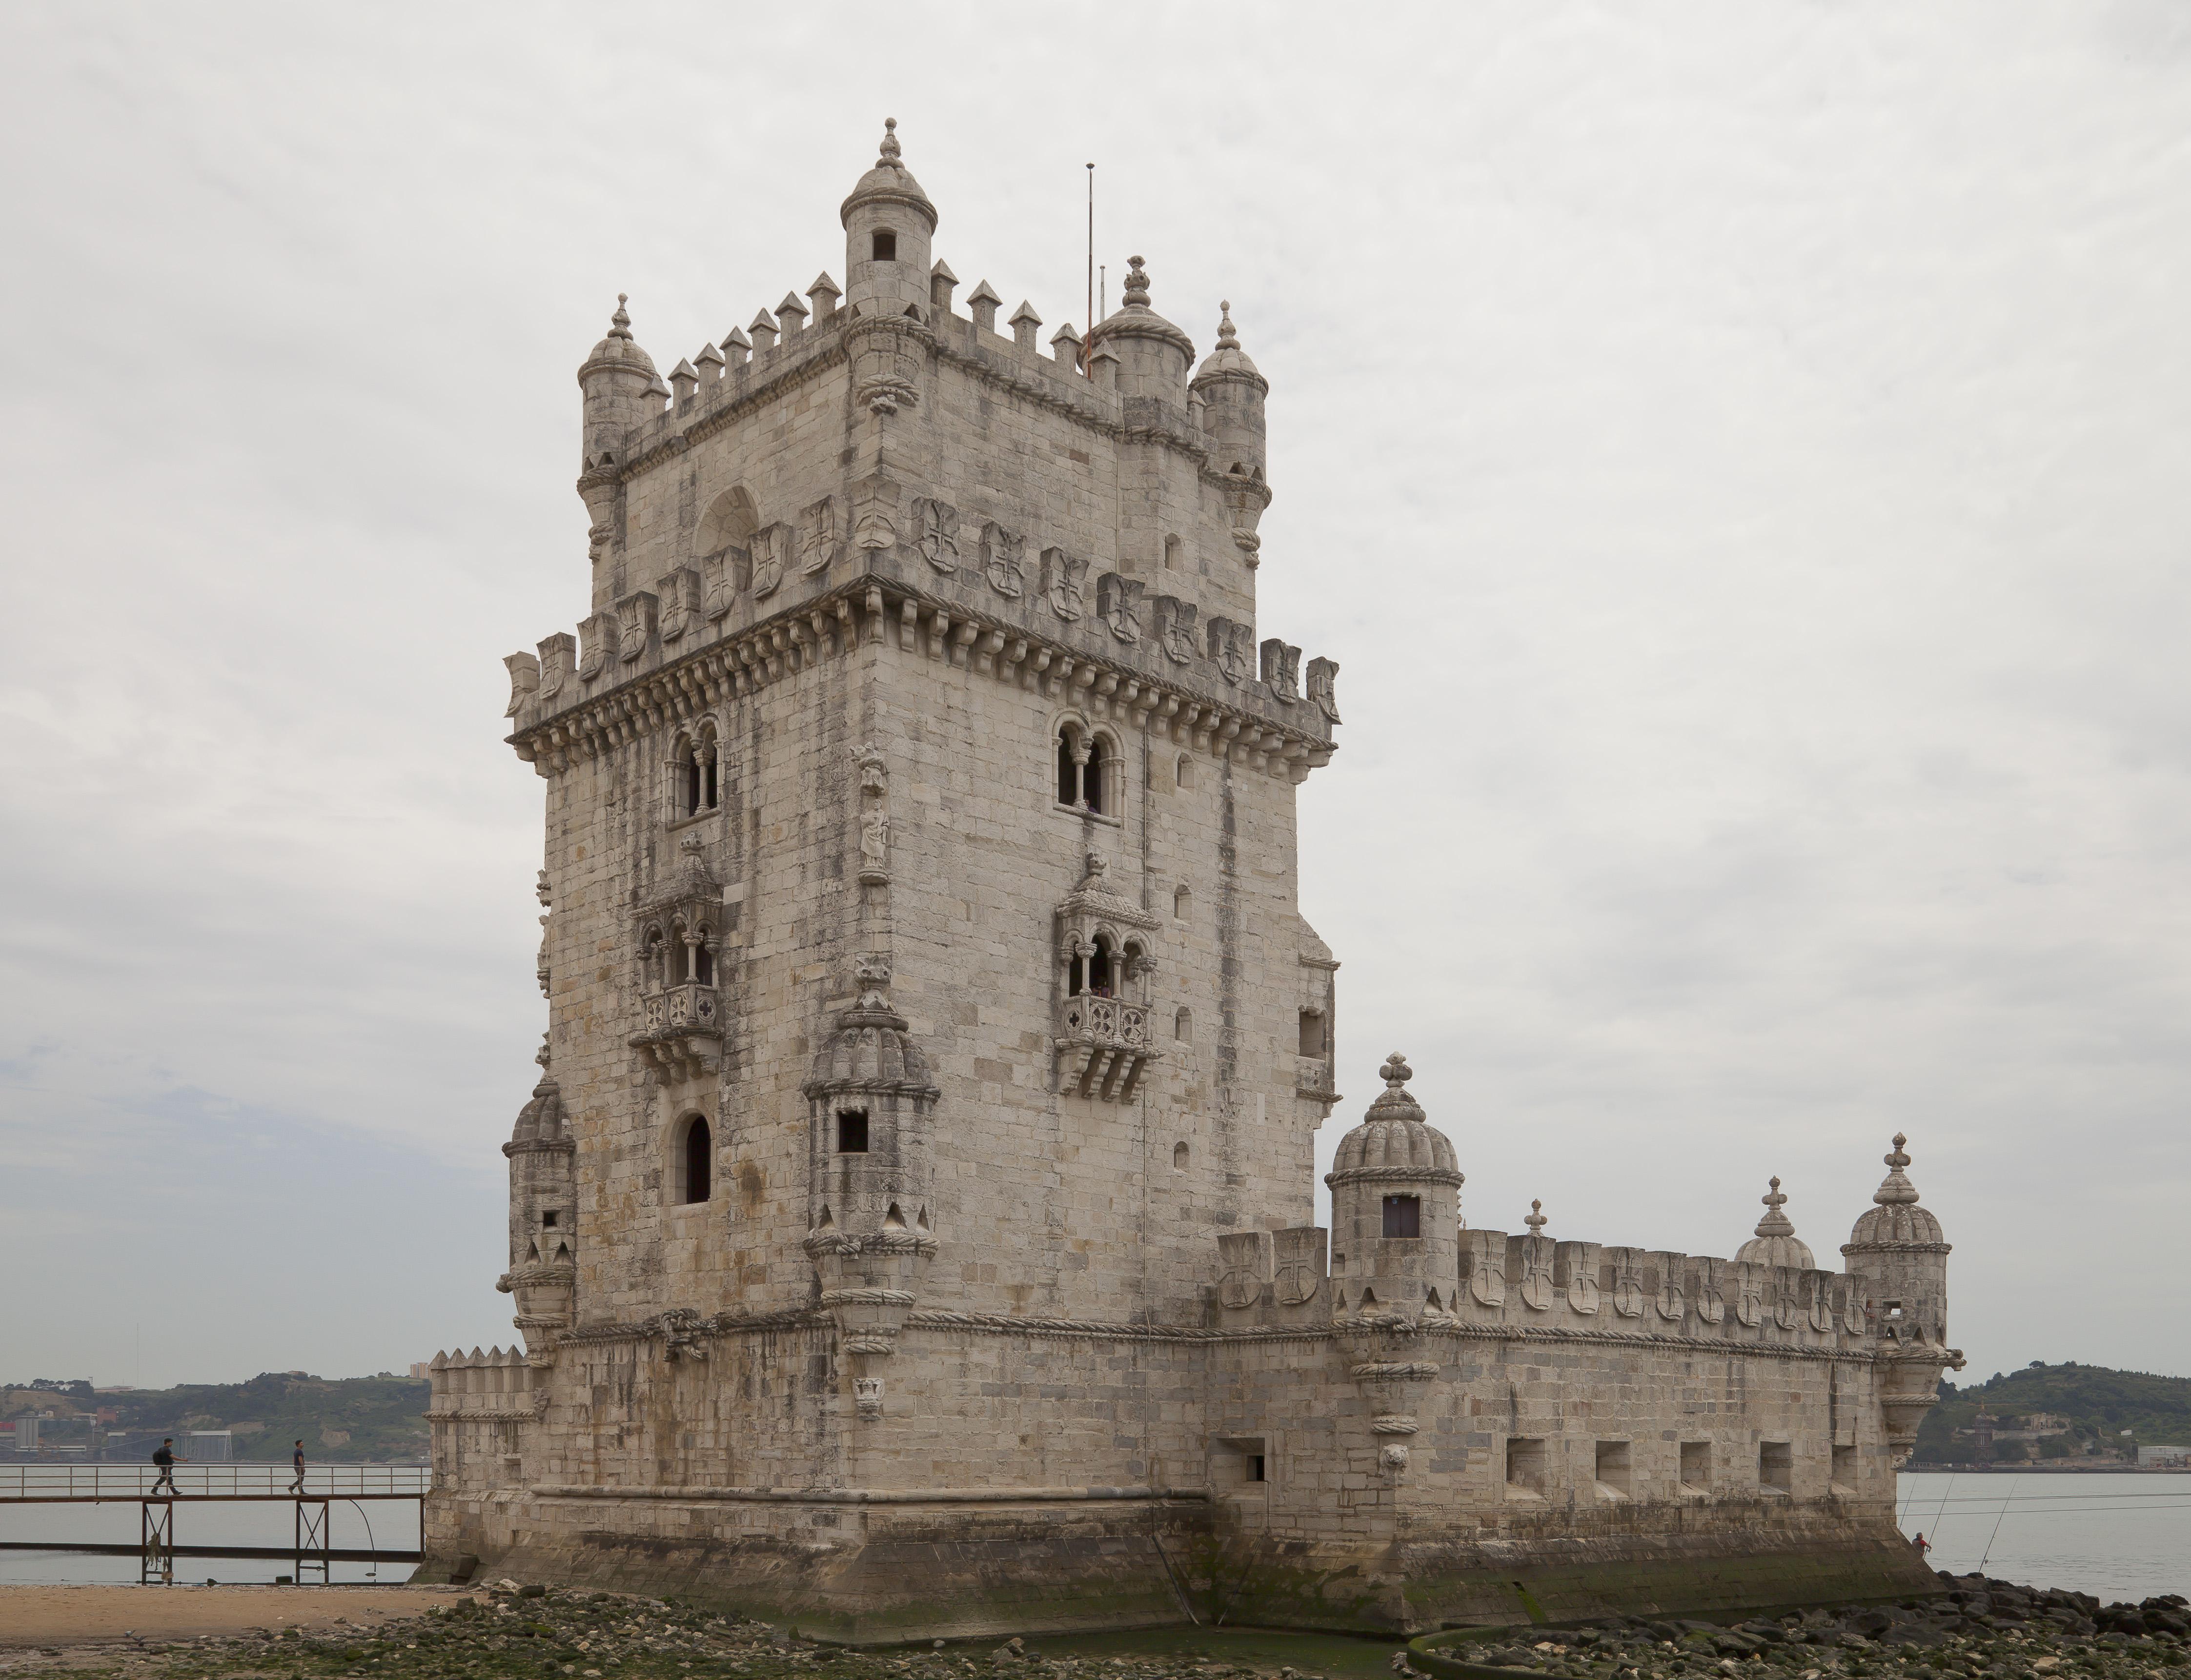 File:Torre de Belém, Lisboa, Portugal, 2012-05-12, DD 16 ...